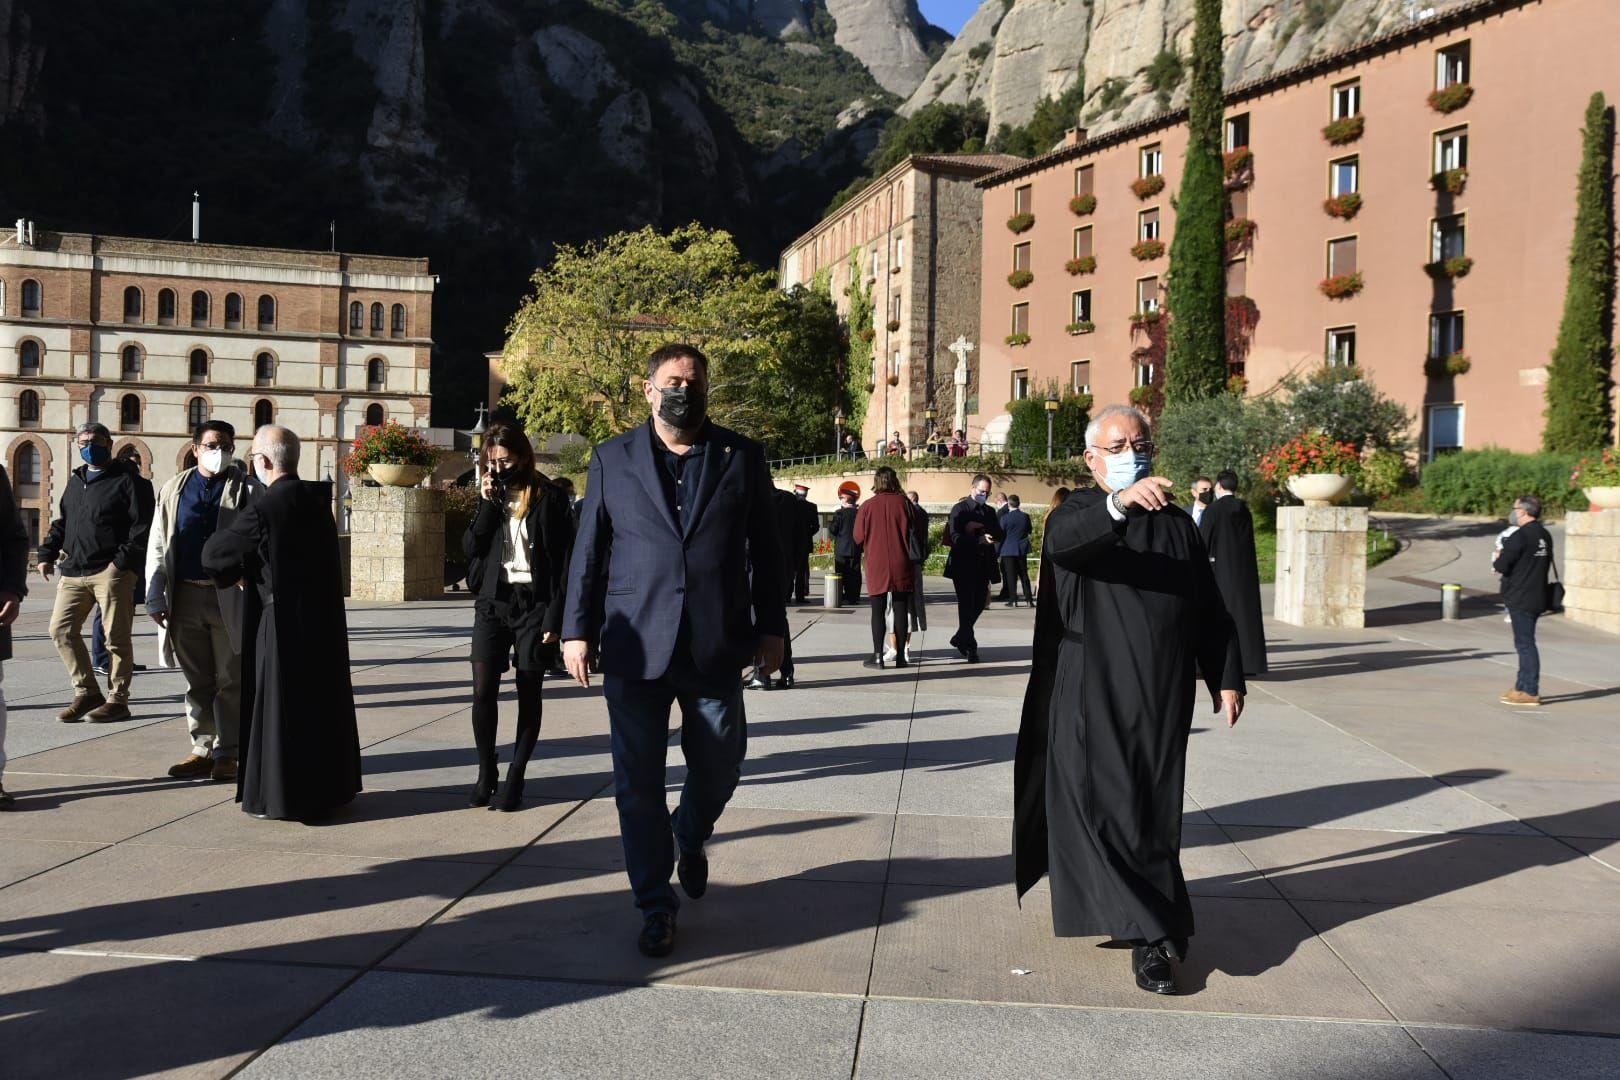 Arribada d'autoritats a Montserrat